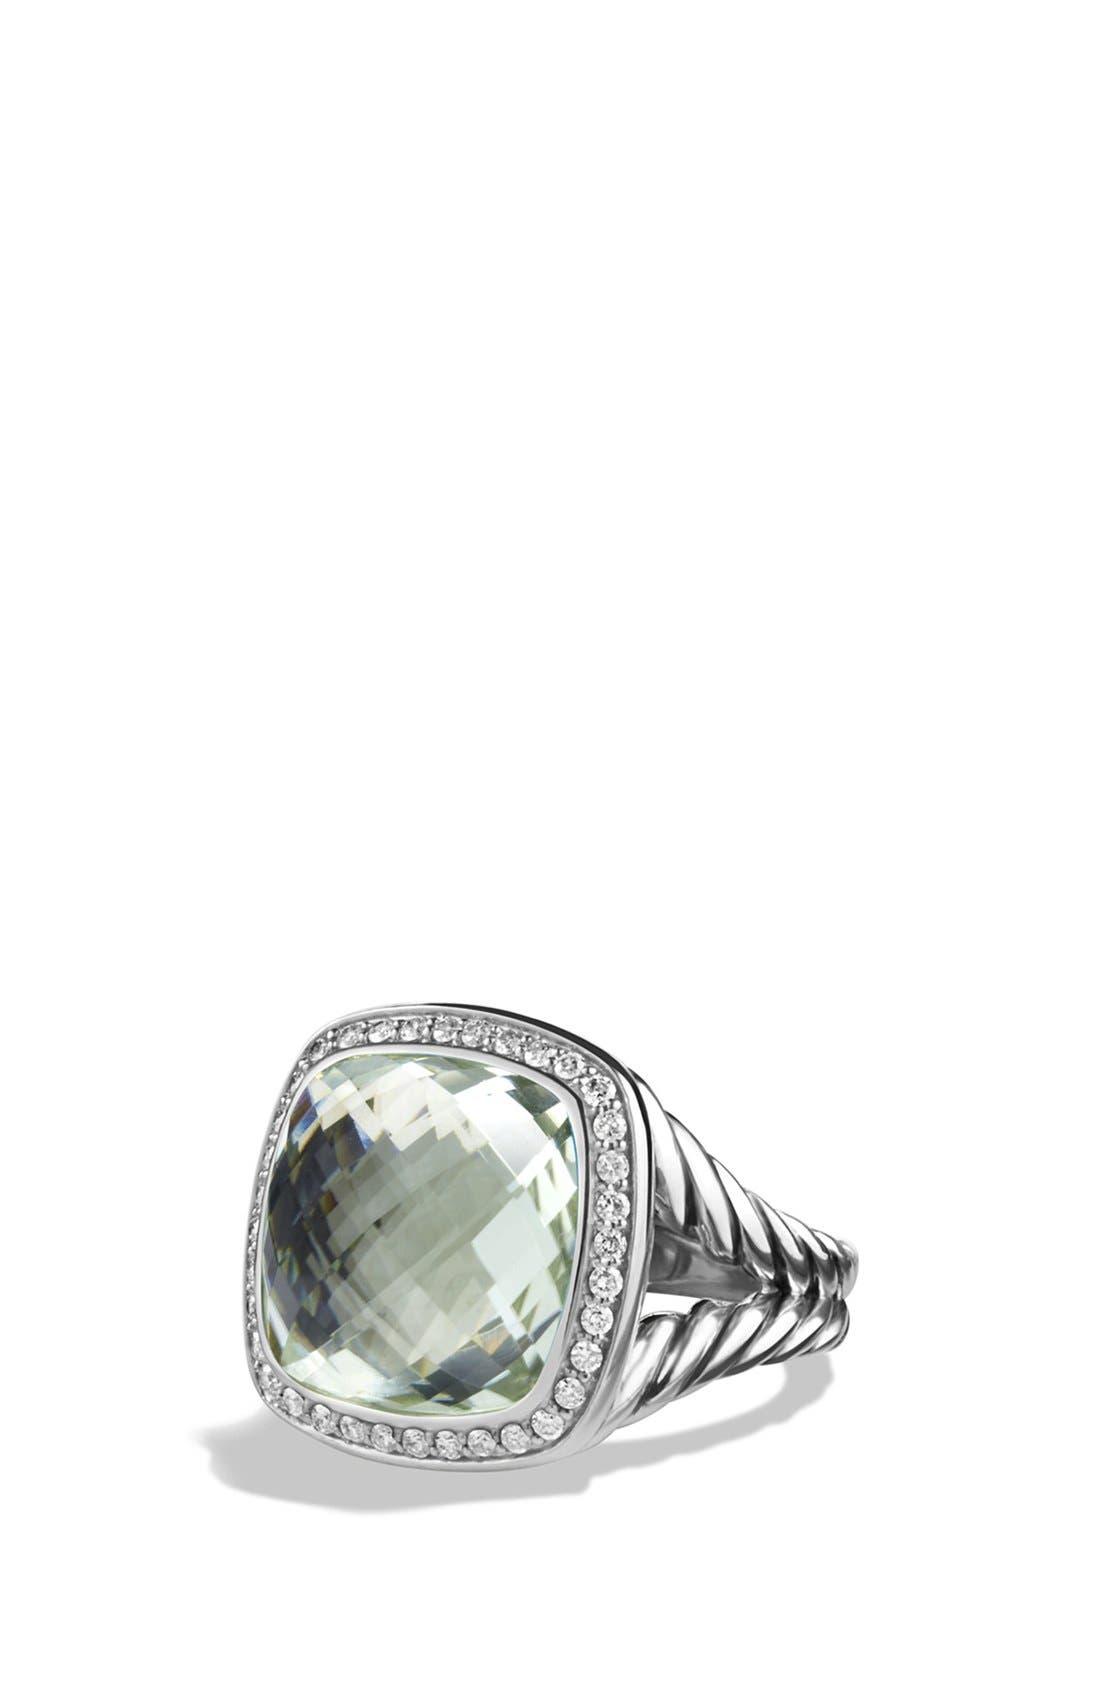 'Albion' Ring with Semiprecious Stone and Diamonds,                         Main,                         color, PRASIOLITE